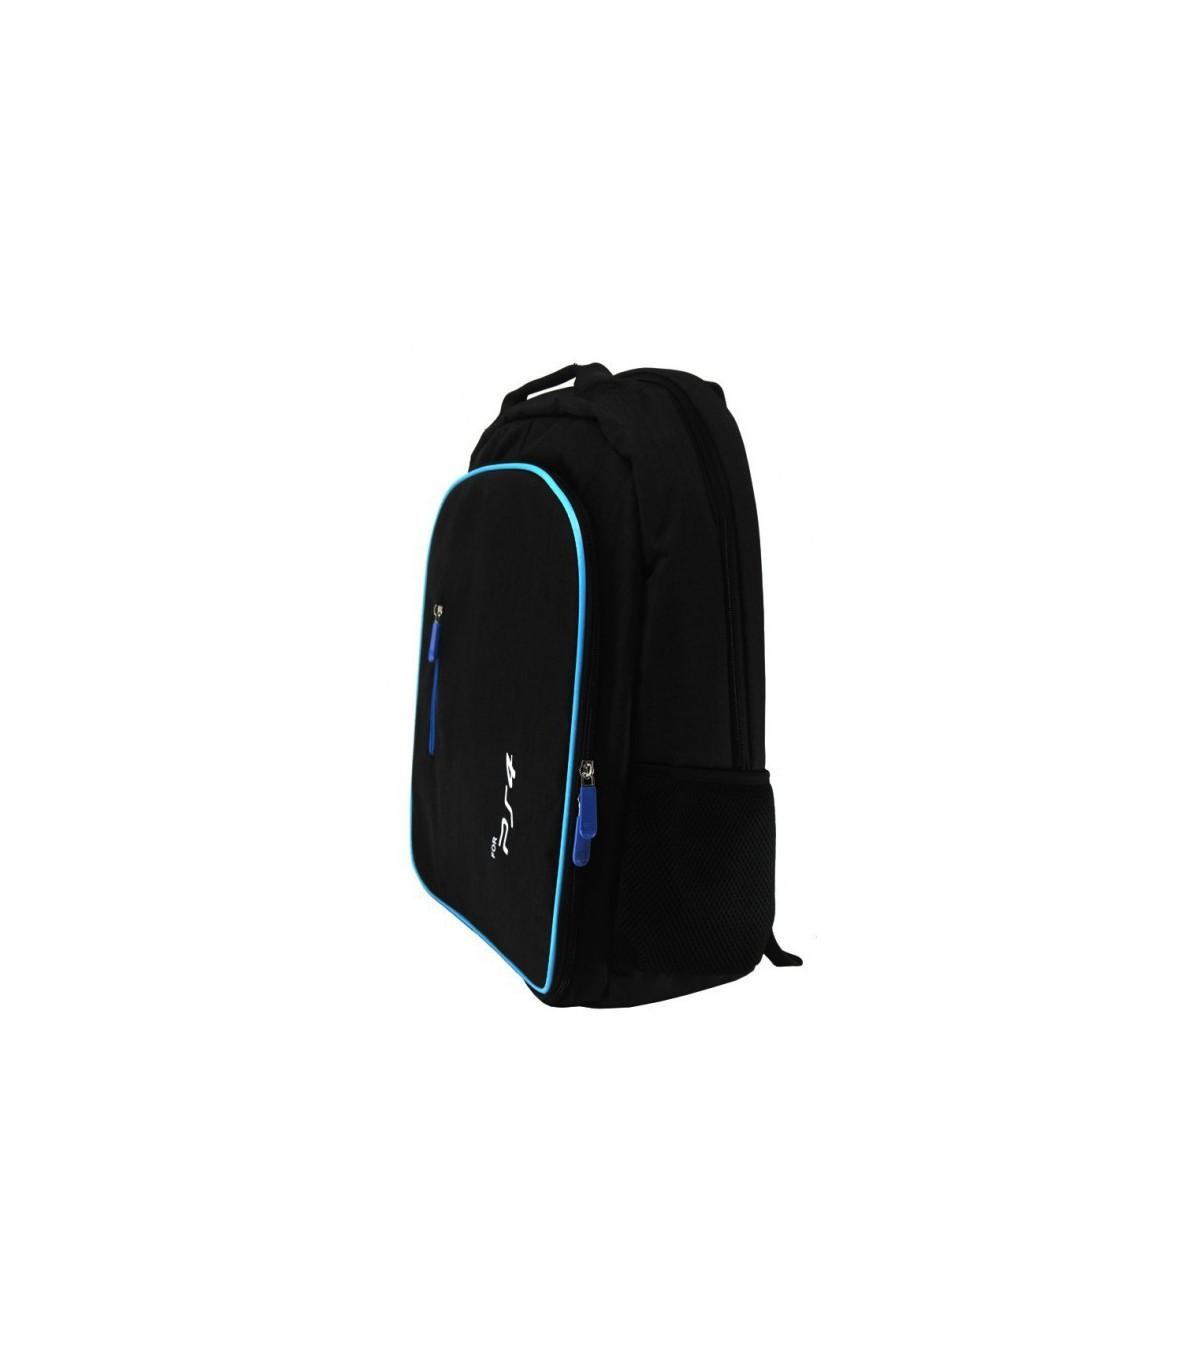 کیف حمل کنسول پلی استیشن ۴ مدل کوله پشتی BackPack Playstation 4